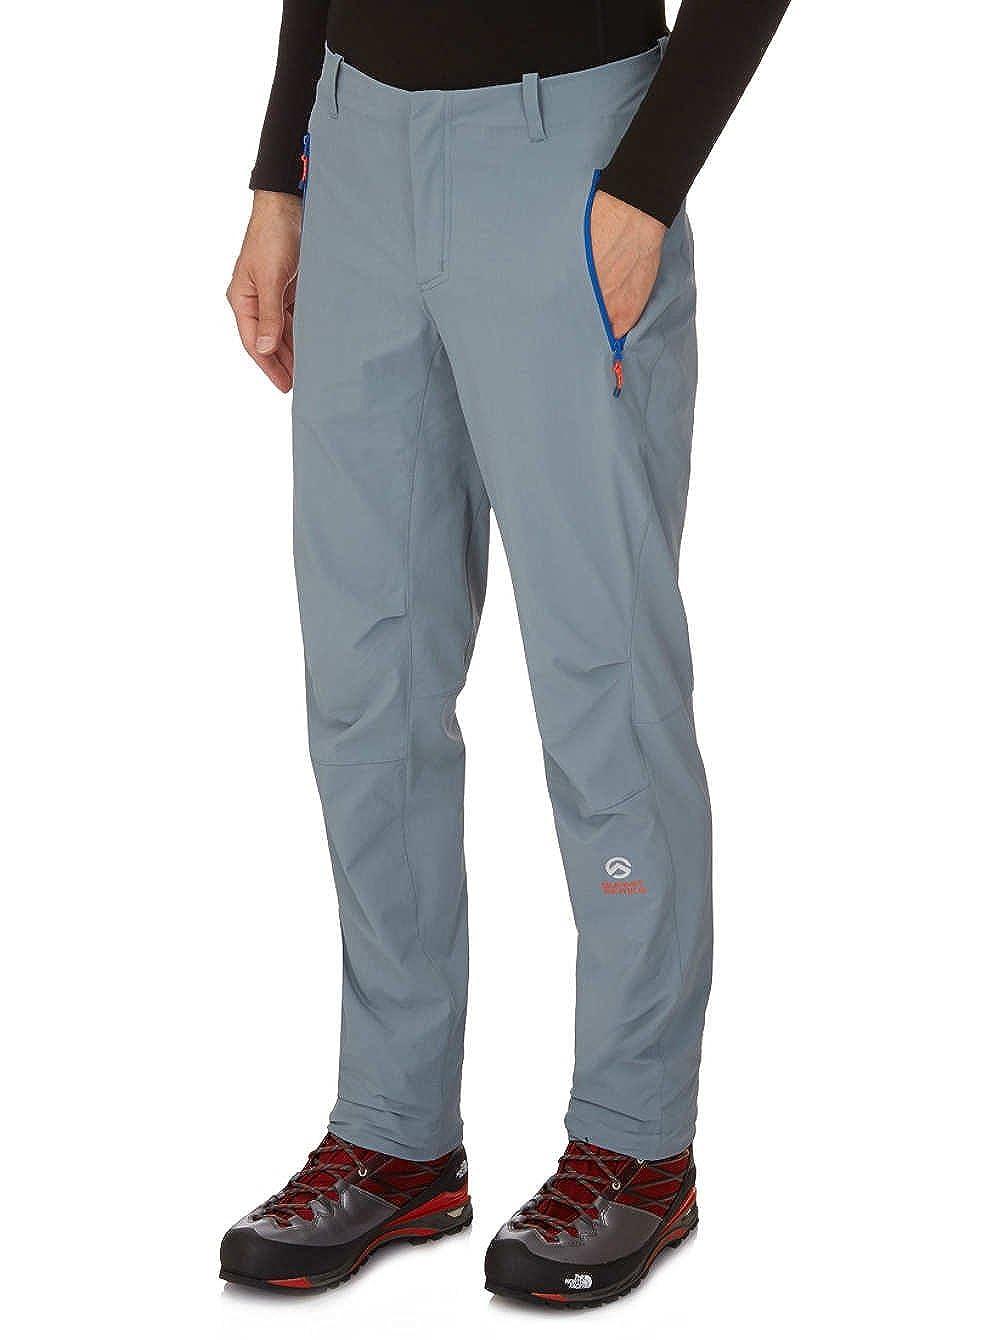 THE NORTH FACE Herren Outdoor Hose Satellite Outdoor Pants